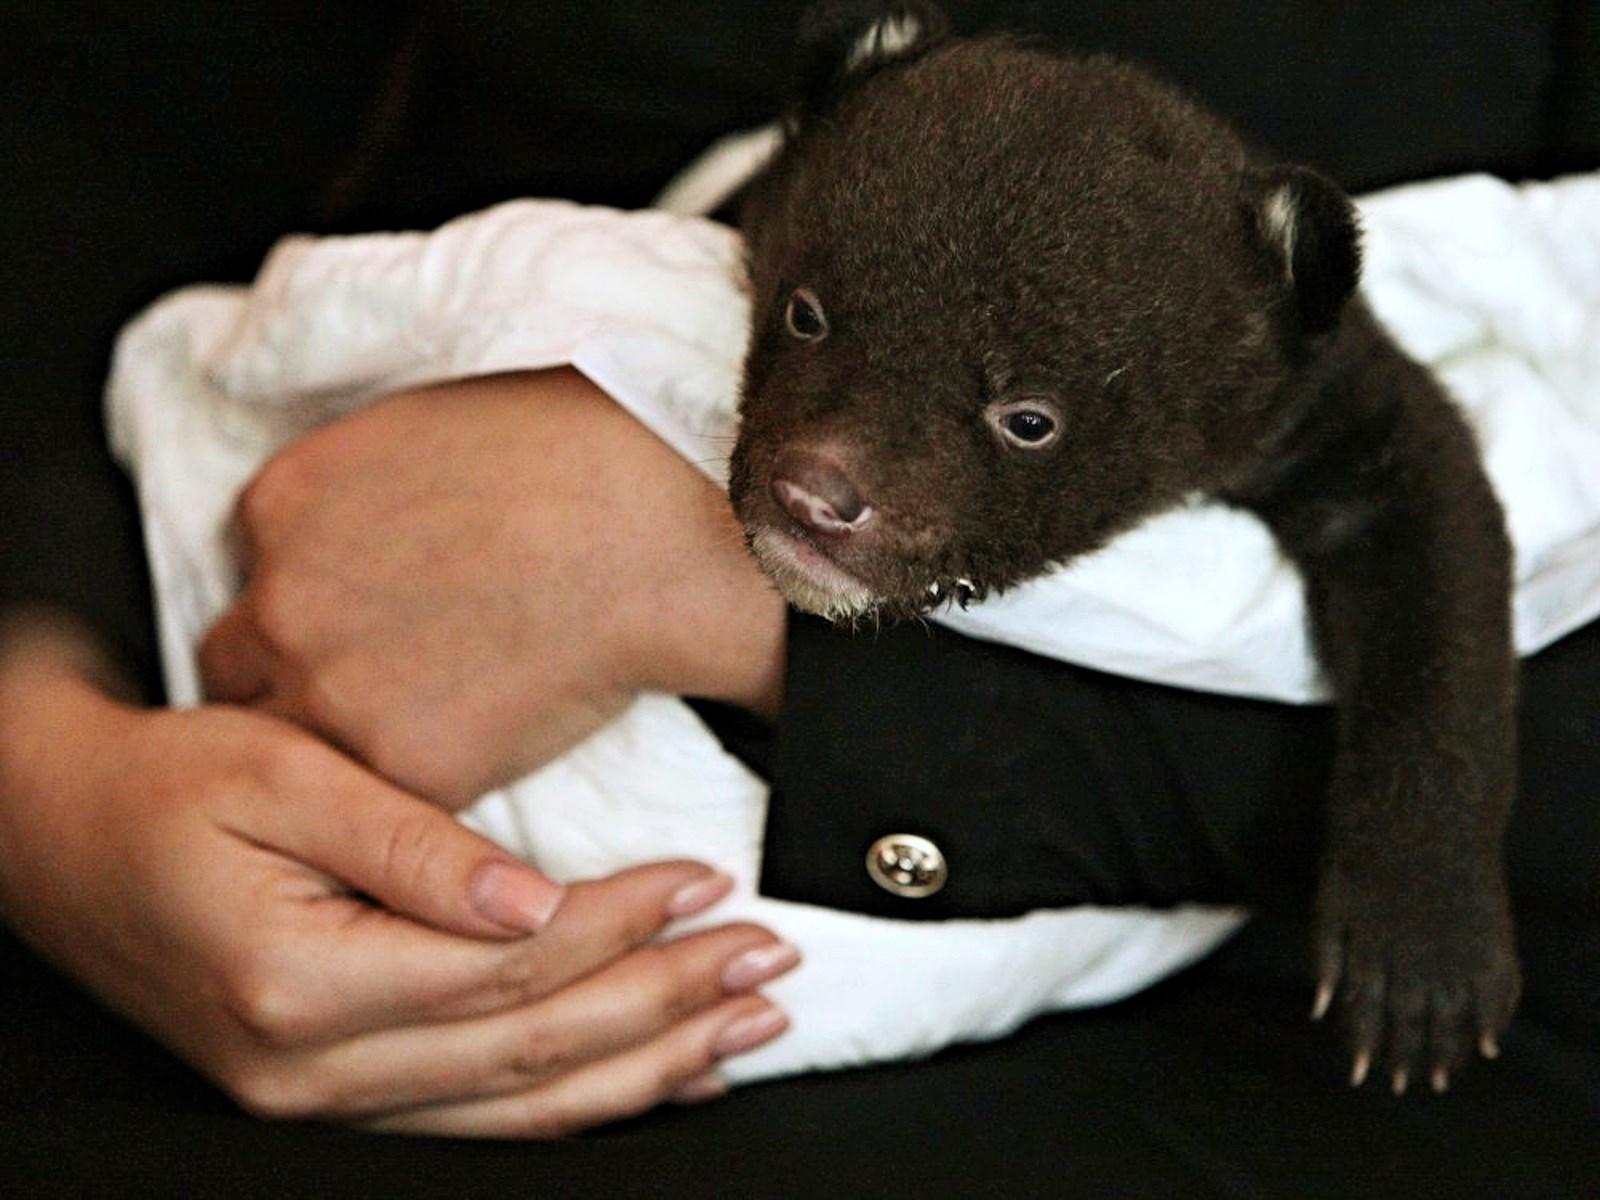 00 black bear cub. vladivostok. russia 01. 27.02.15